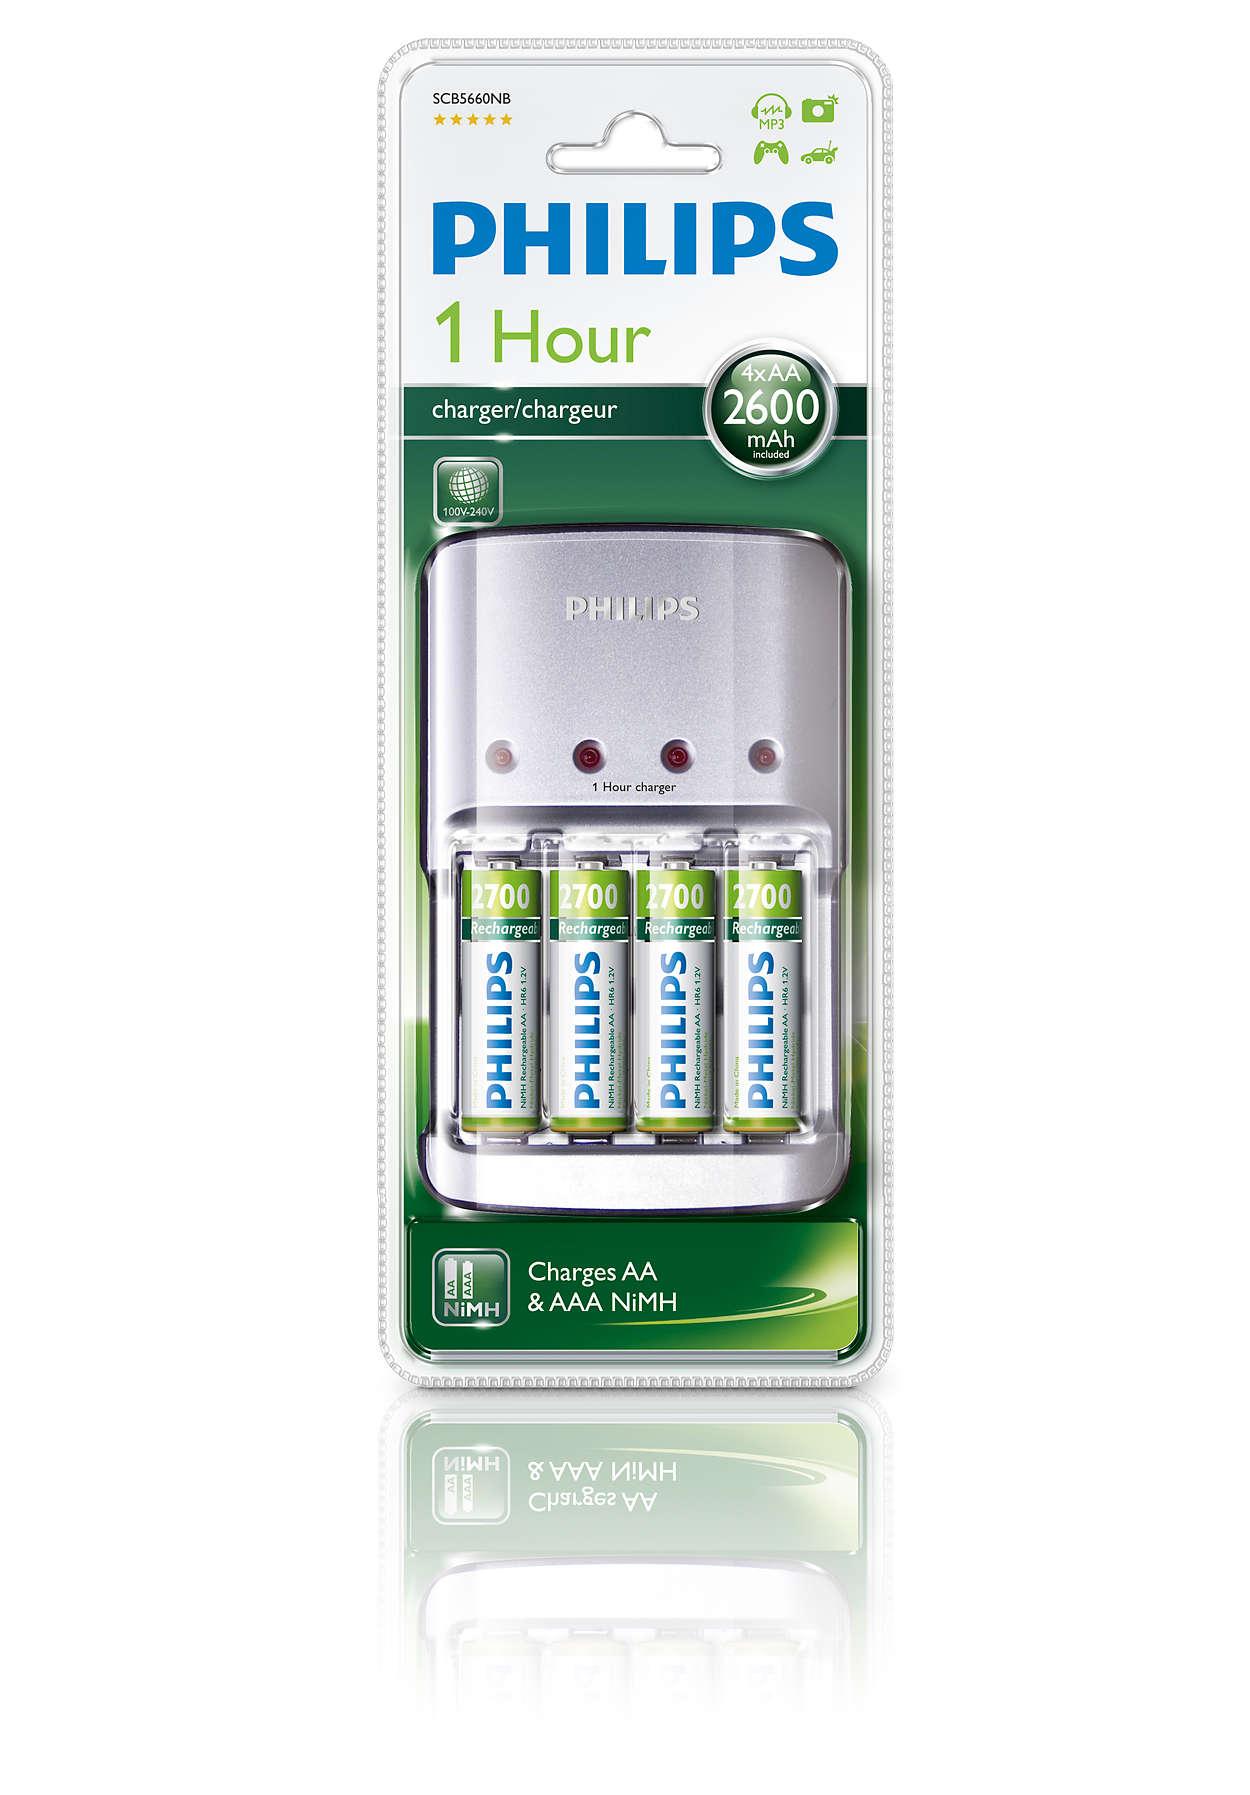 Ladda 2~4 AA/AAA-batterier fulla på 1 timme